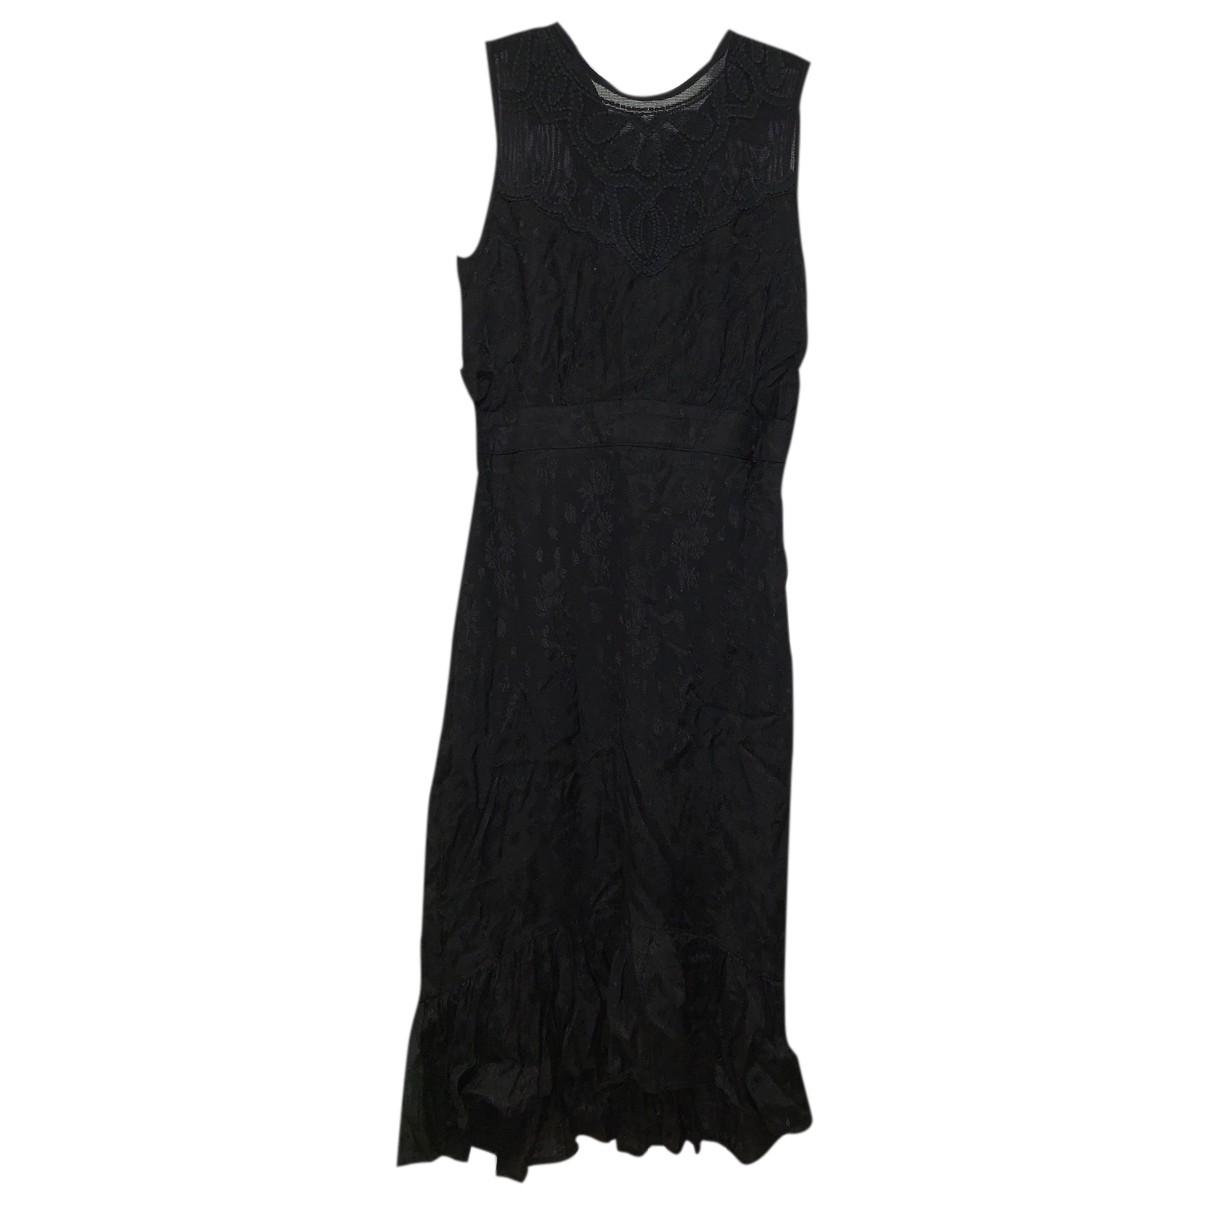 Hoss Intropia \N Kleid in  Schwarz Viskose